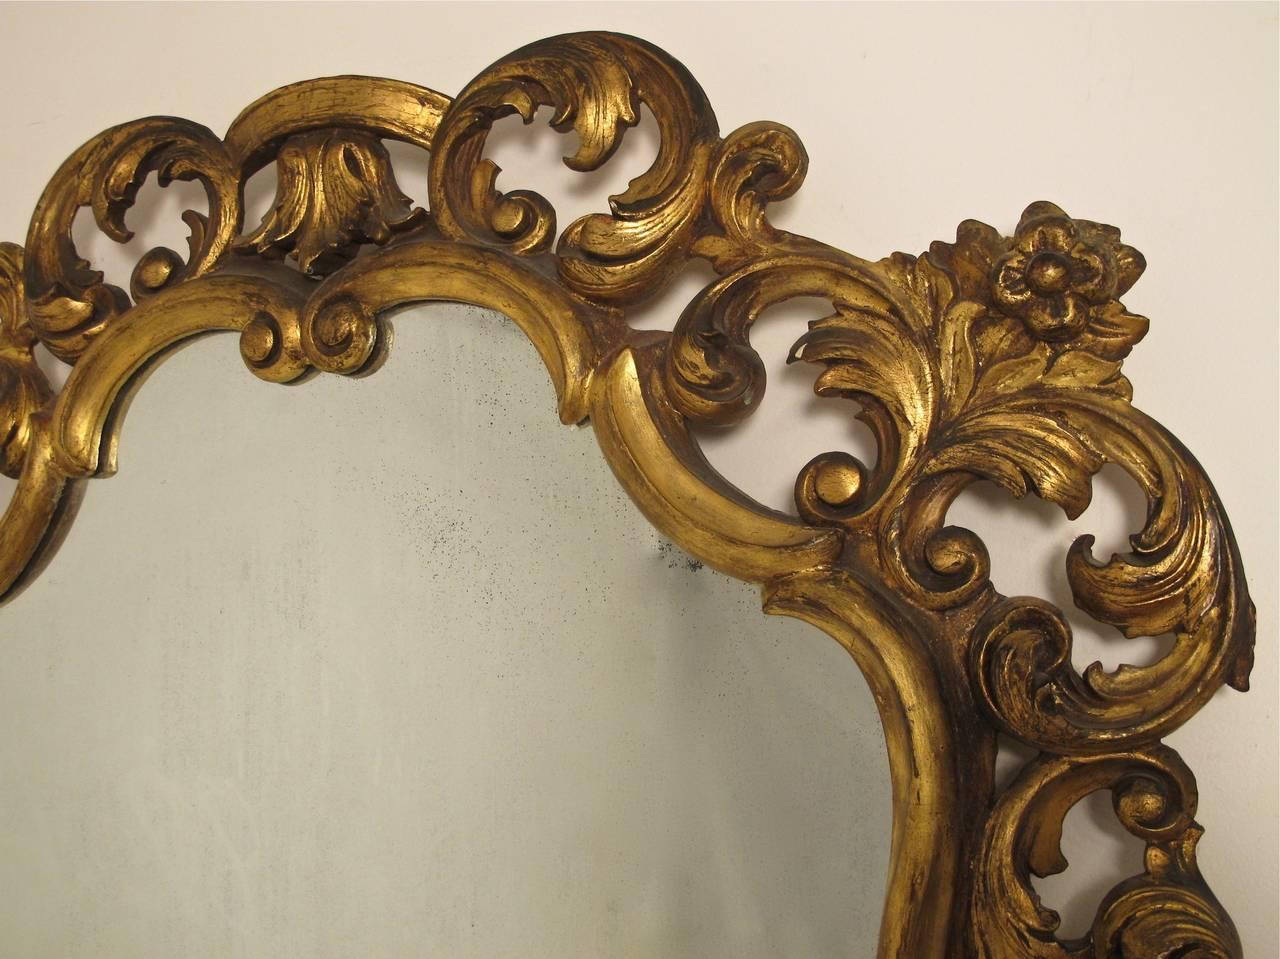 20th Century Italian Rococo Style Giltwood Mirror For Sale